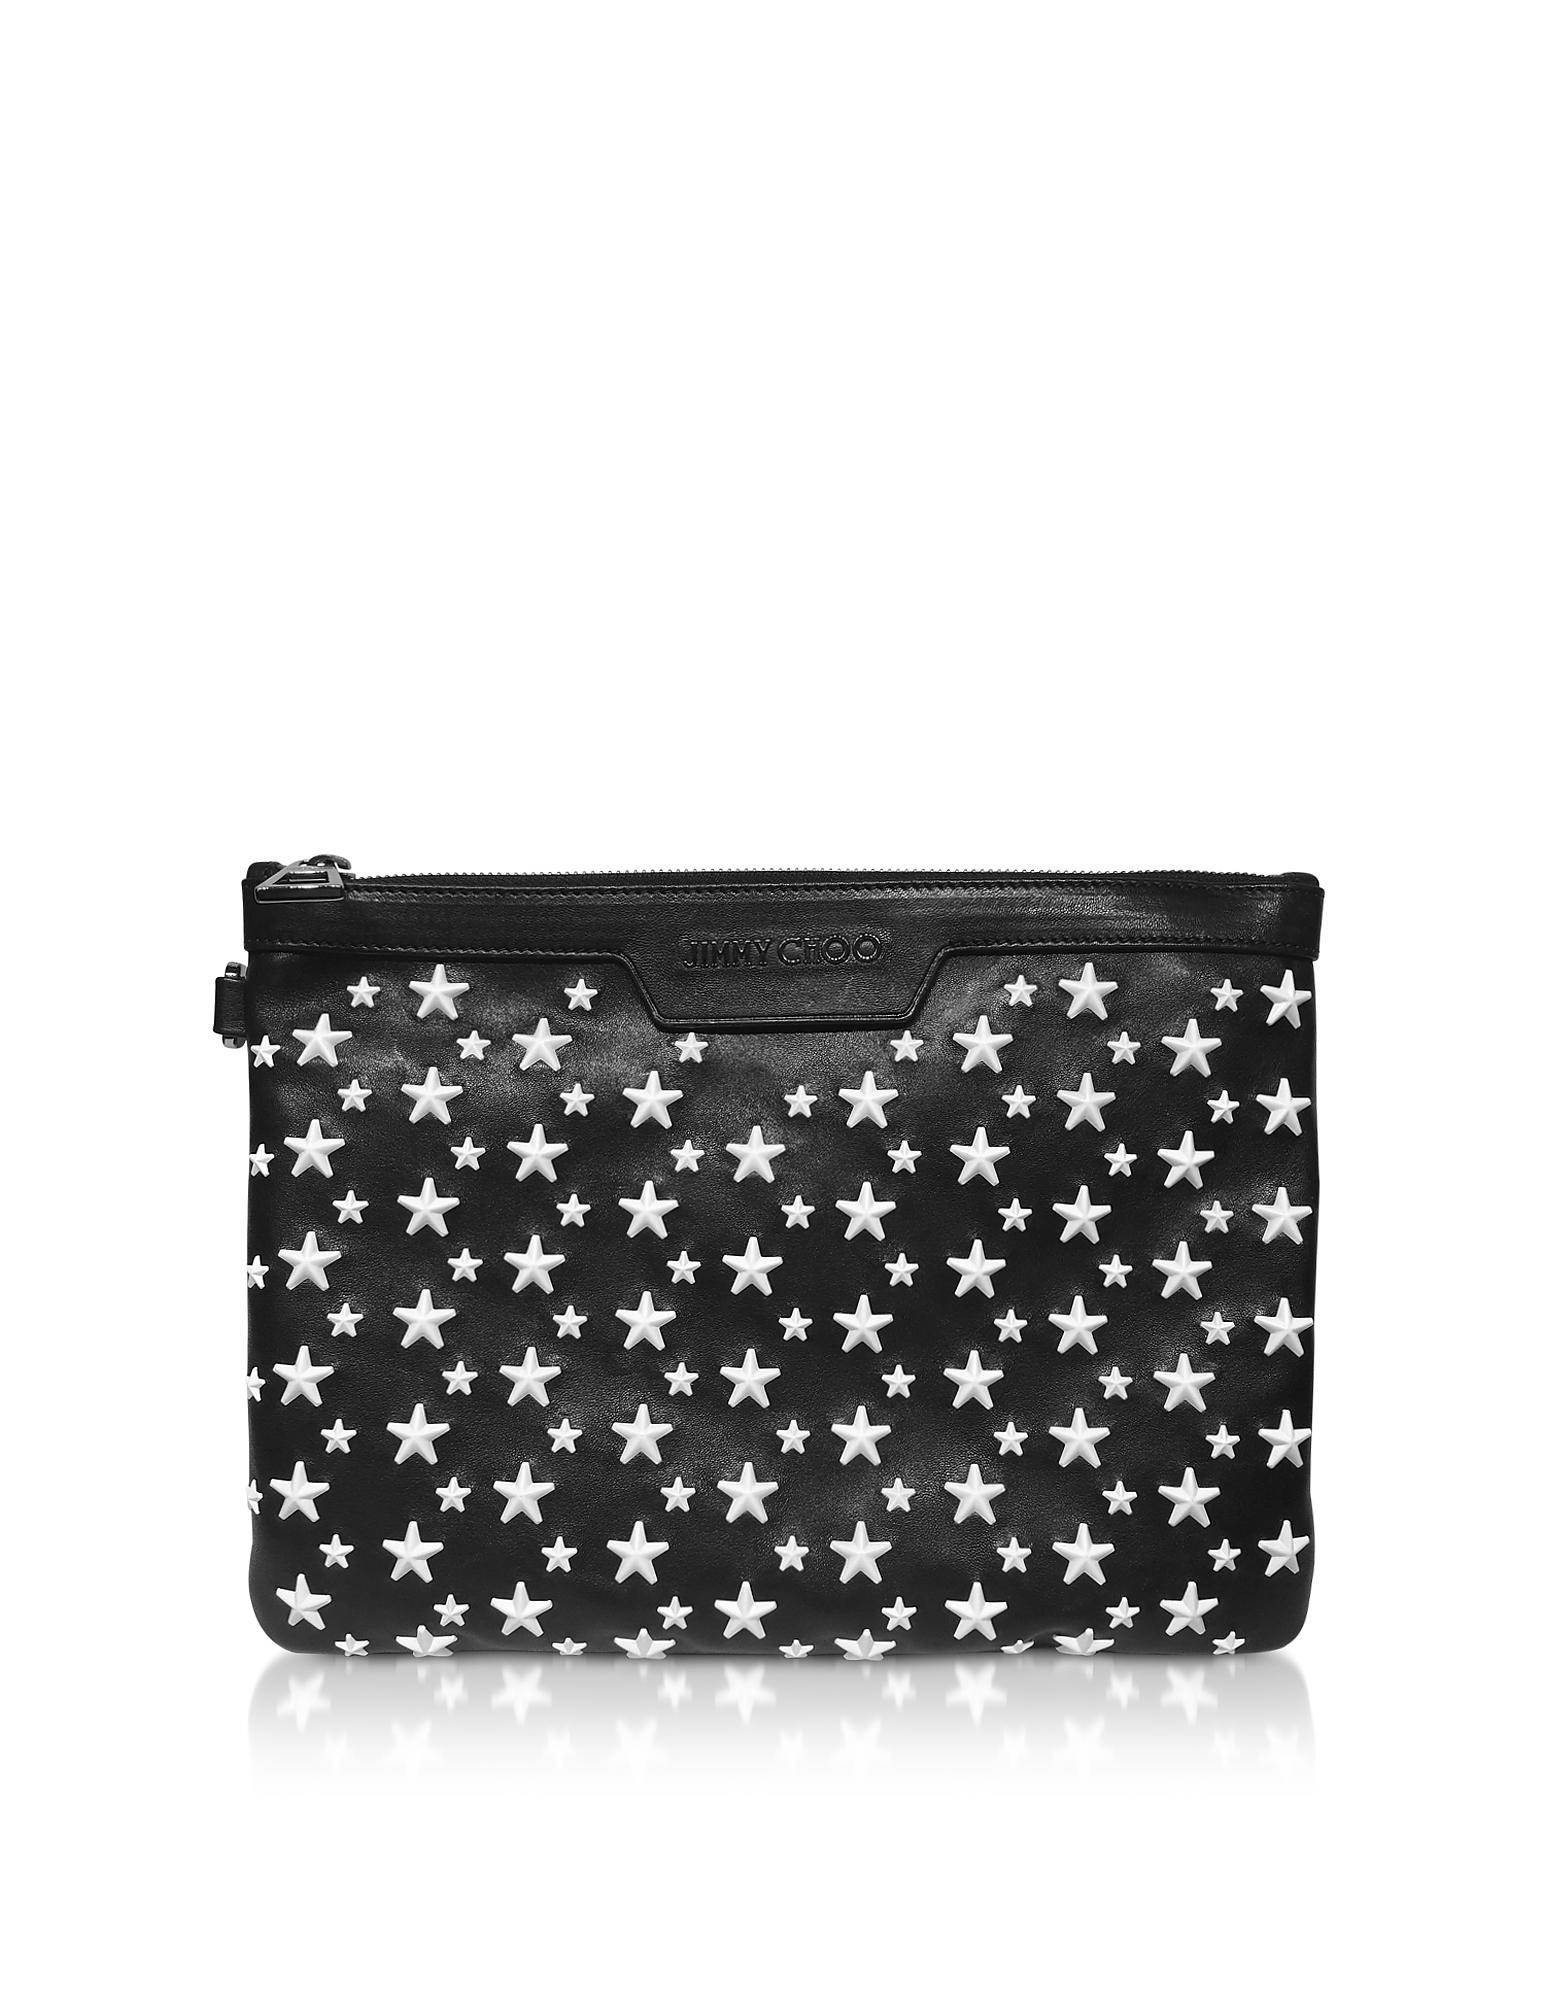 Black&White DEREK/S Small Clutch w/Stars